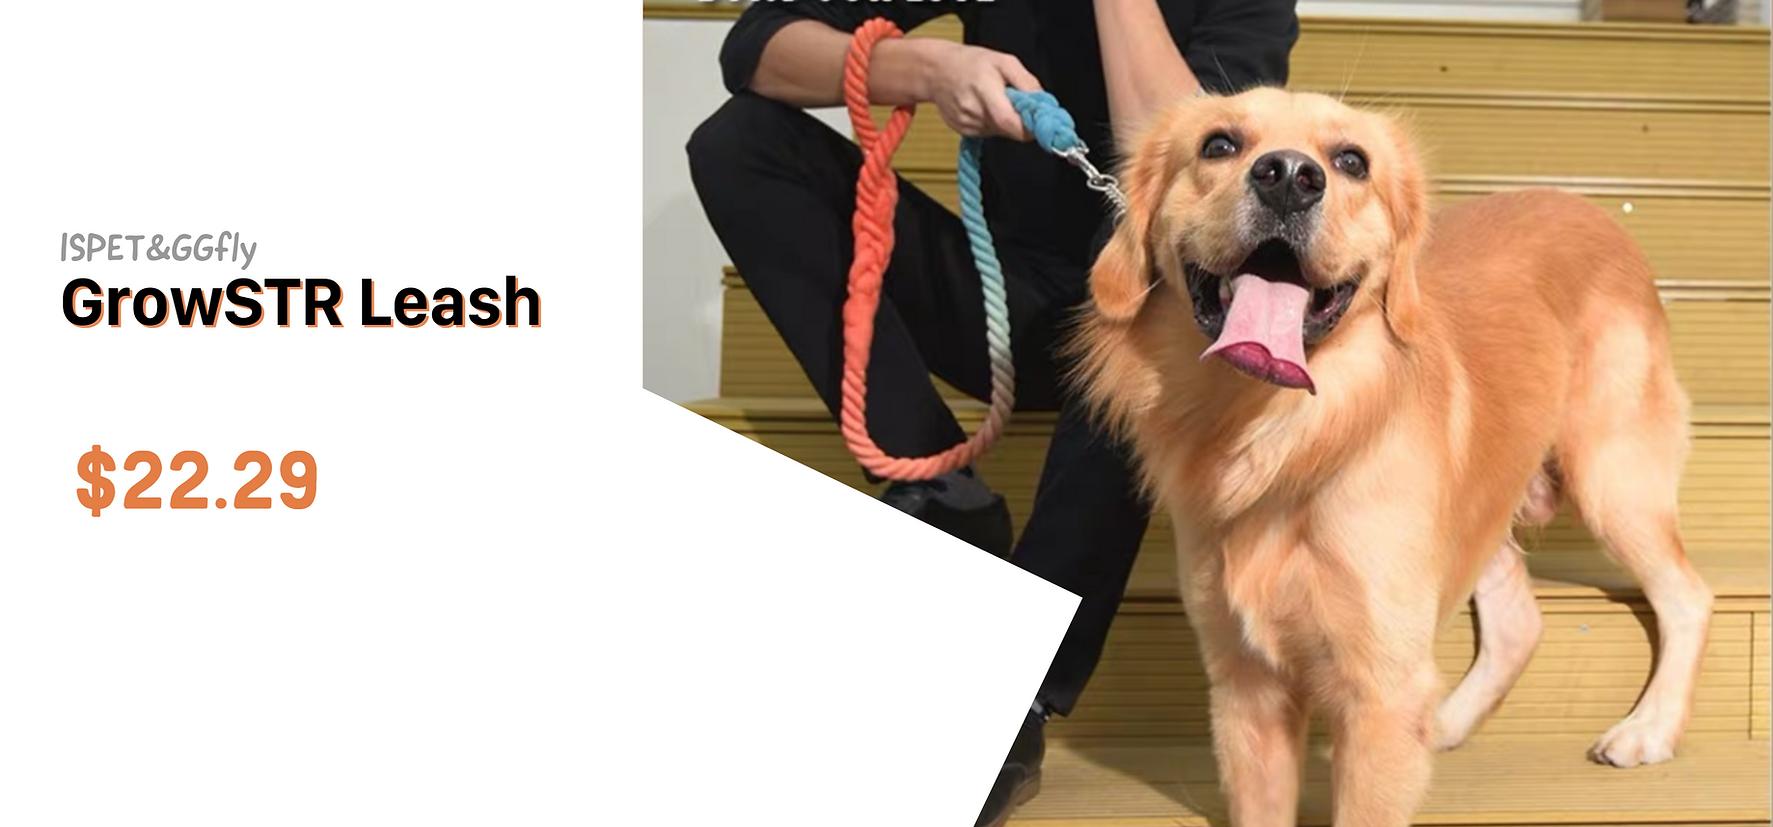 Ispet cotton leash